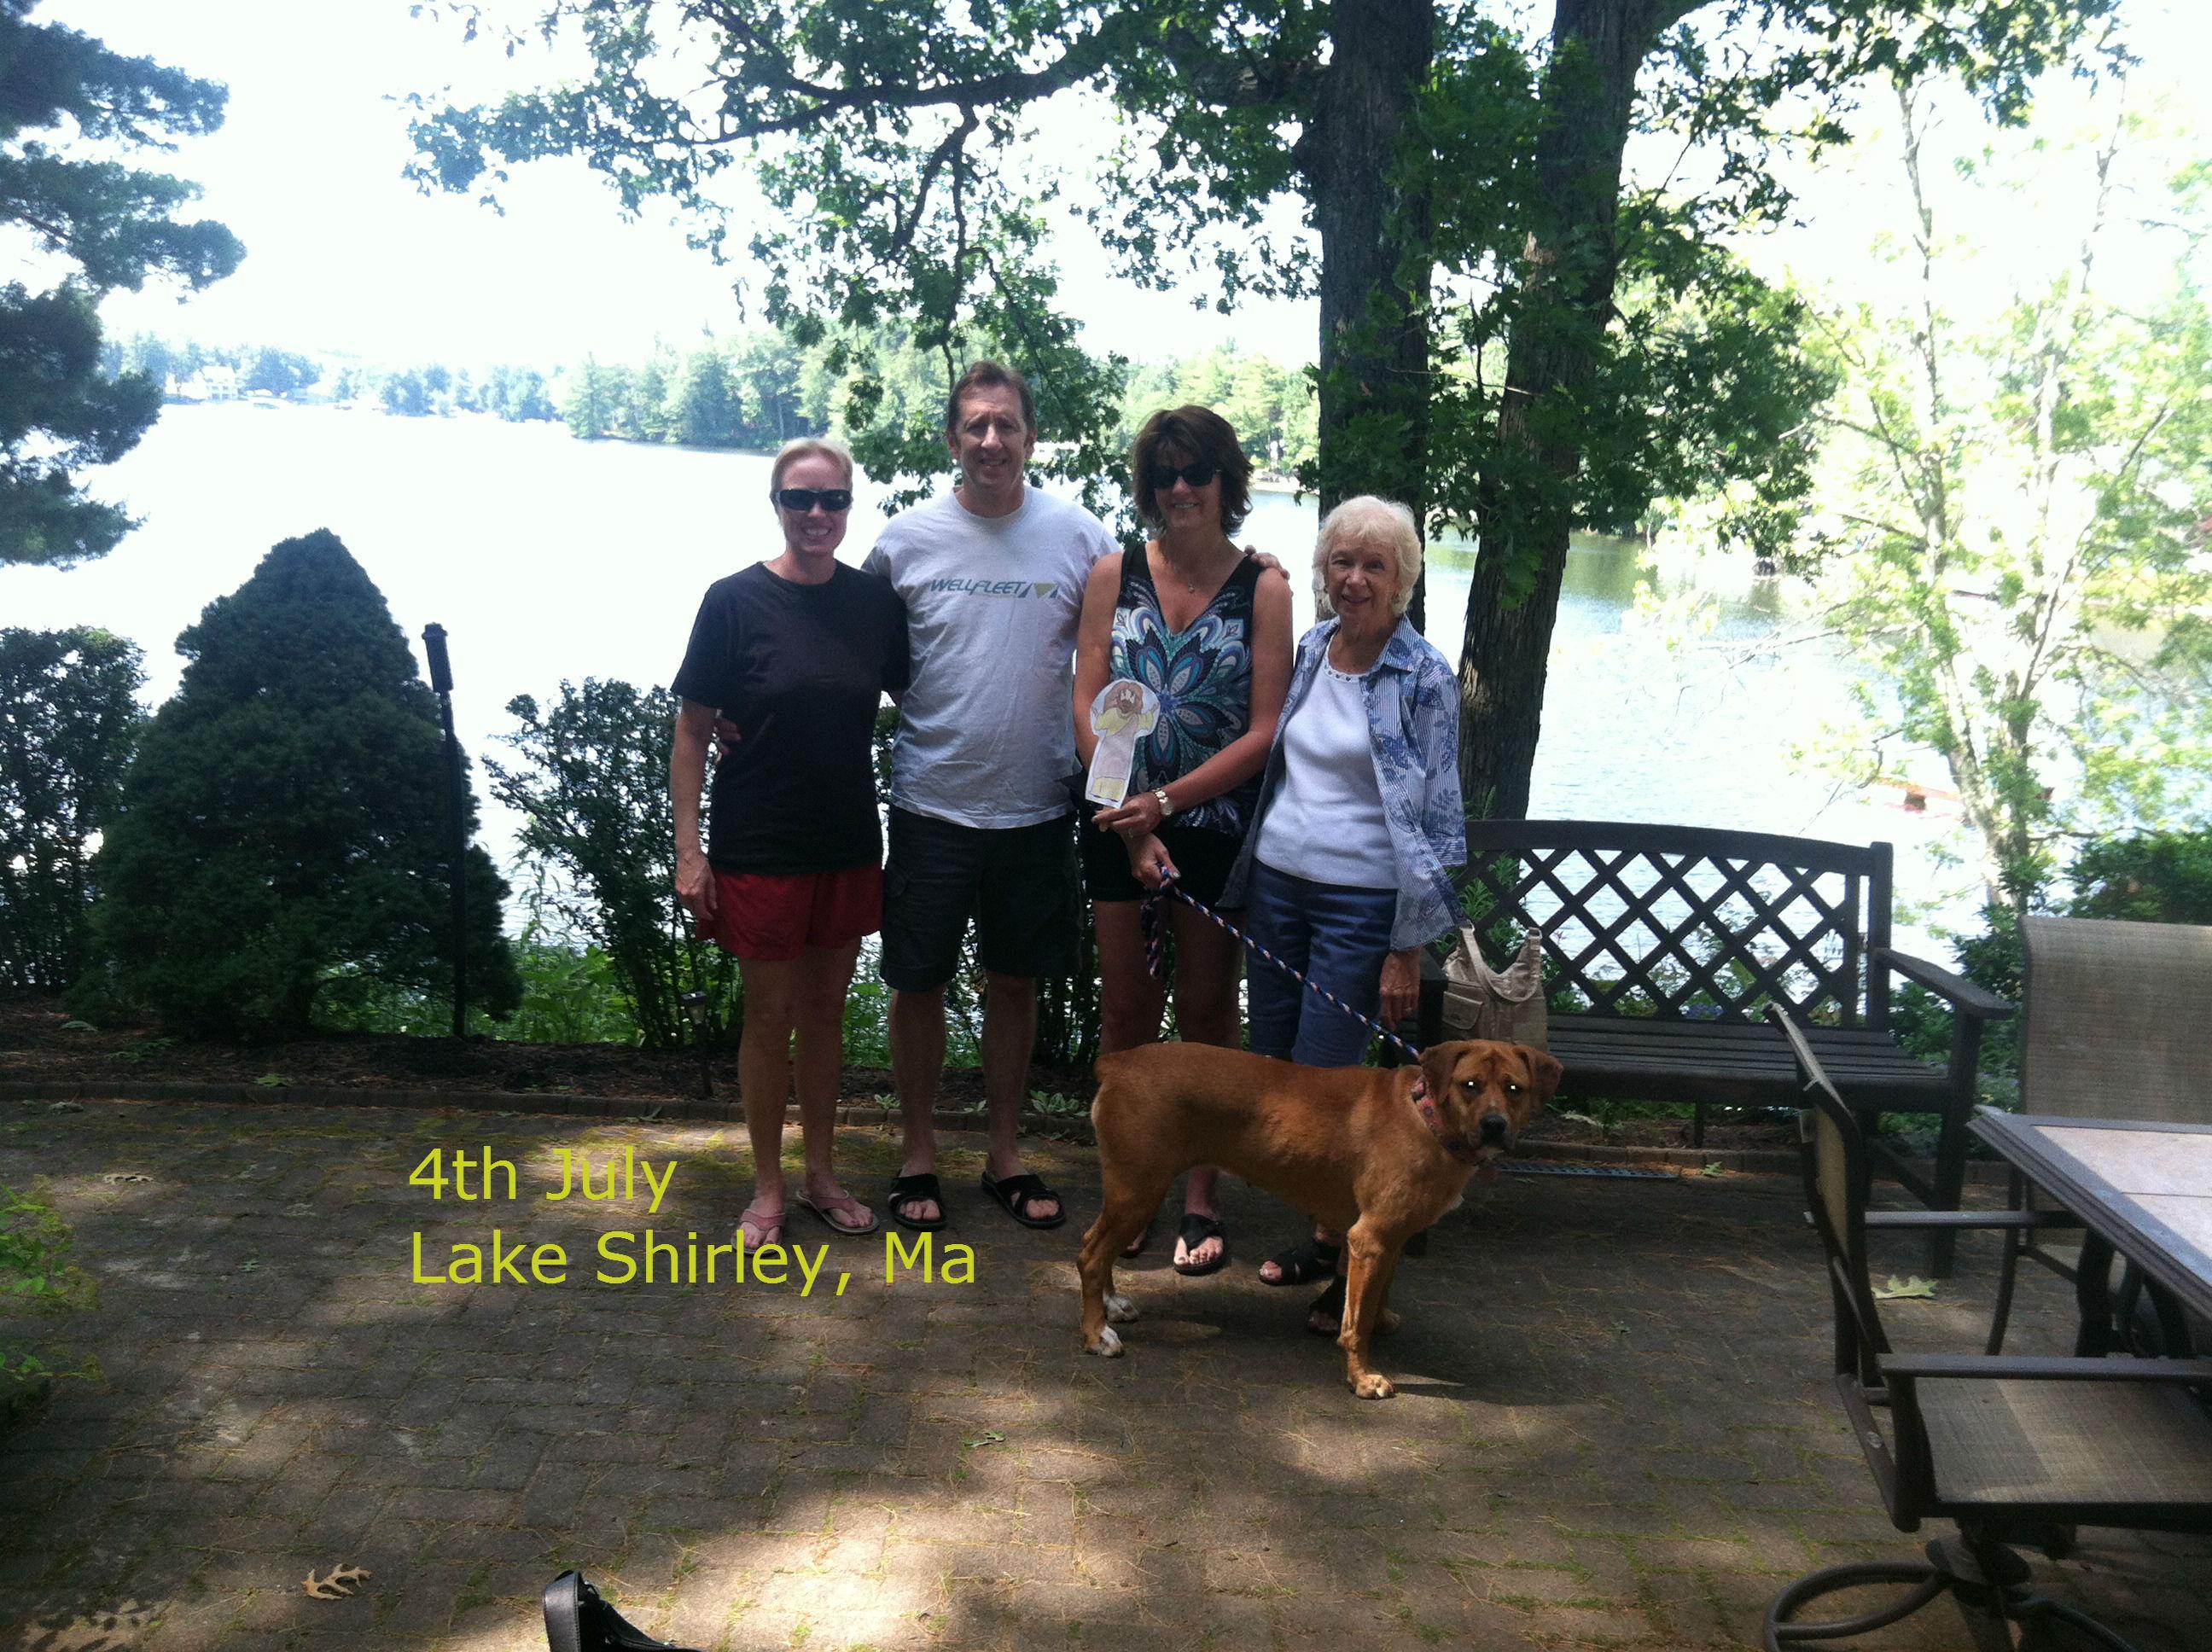 LakeShirley